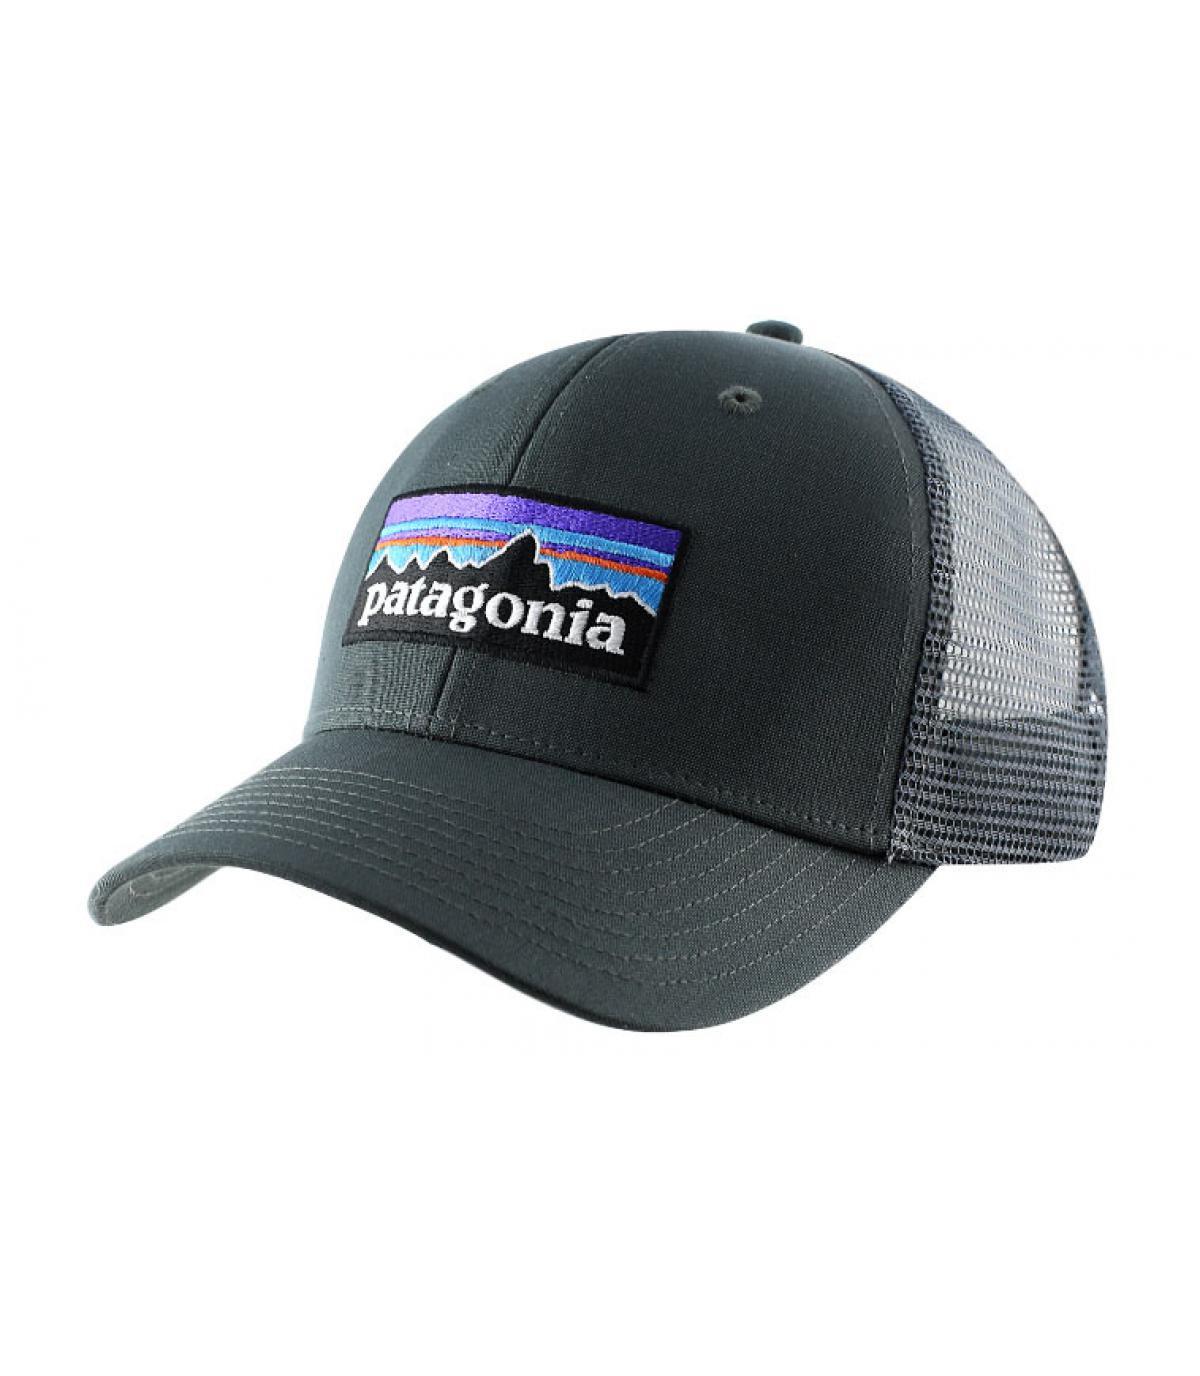 gris gorra con visera curvada - P6 logo trucker hat forge grey de ... 4ed3e3d3eb1